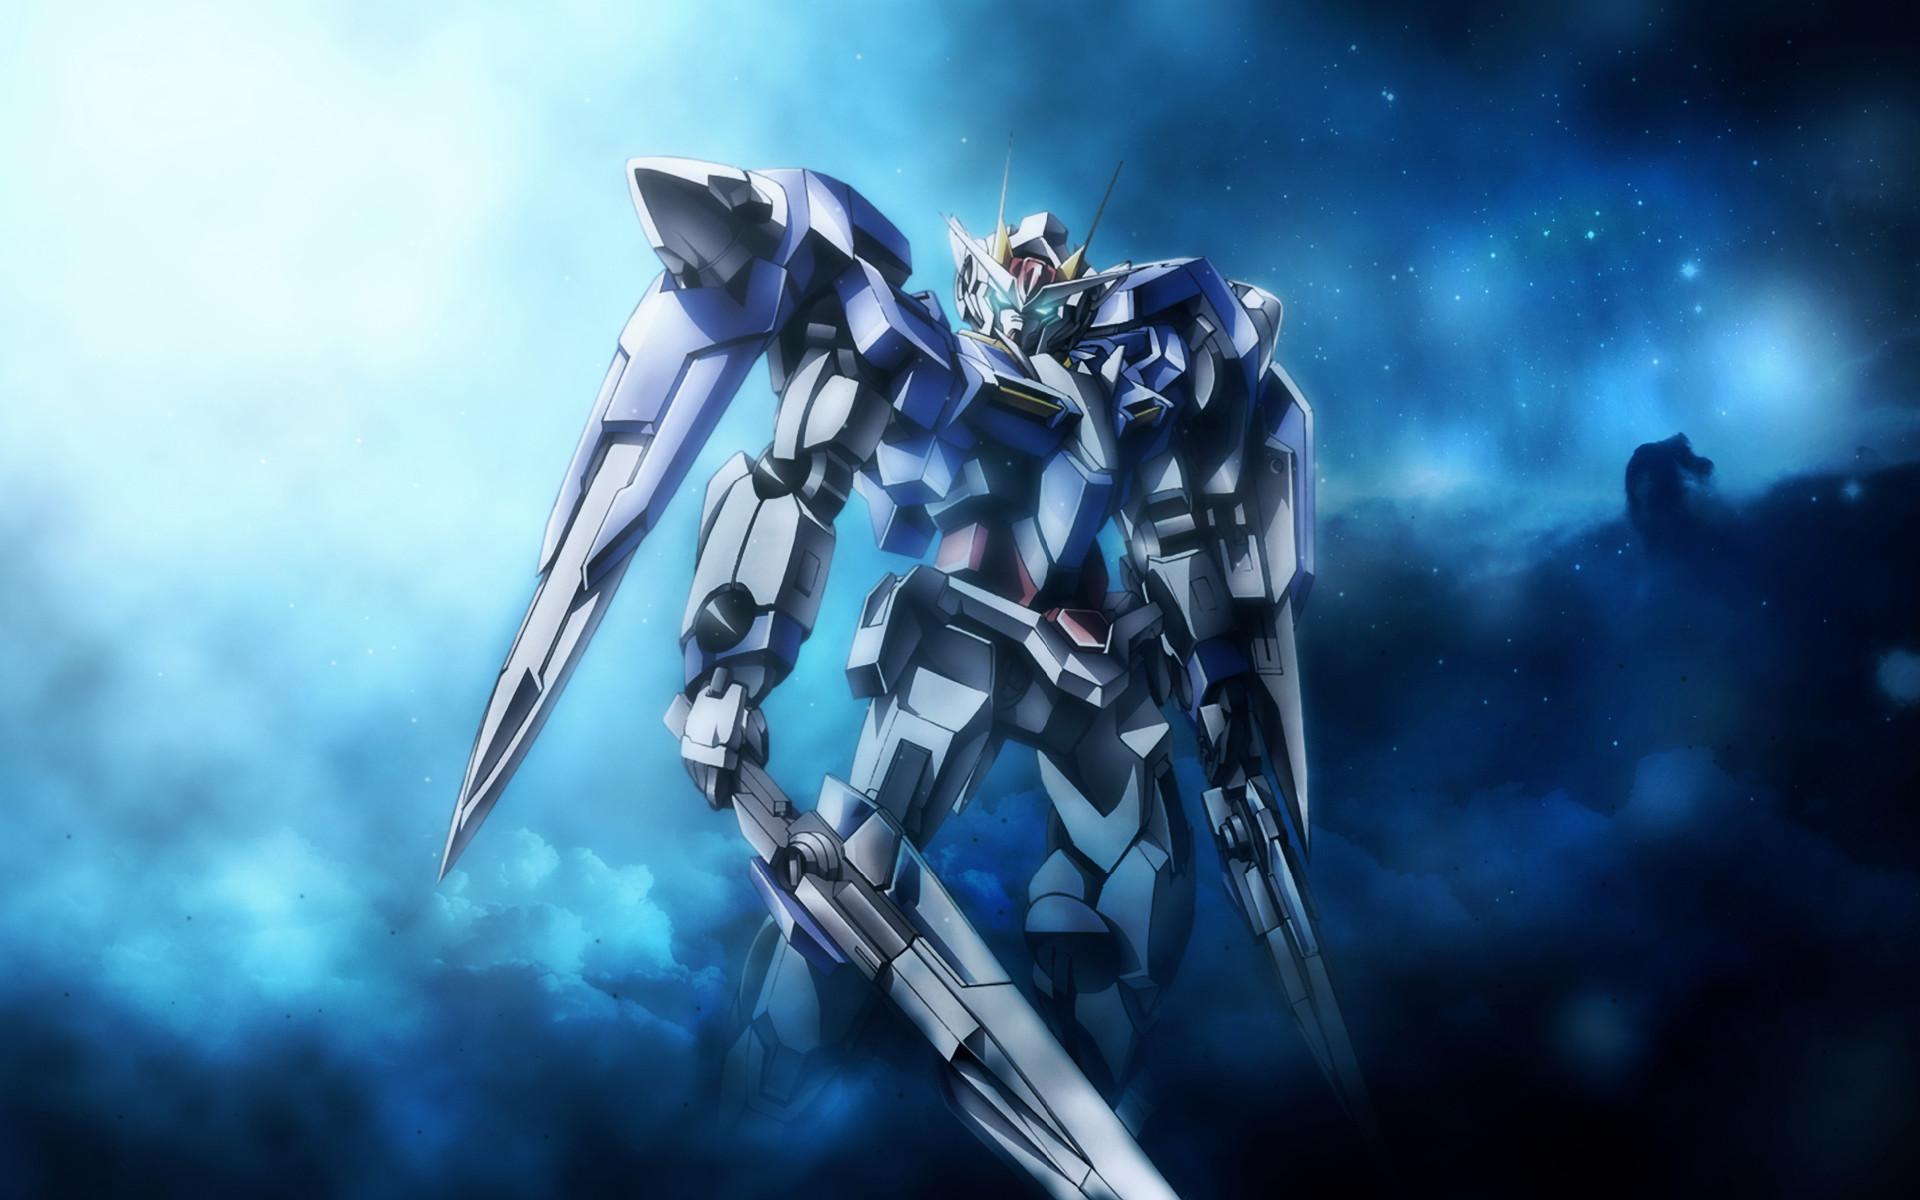 Hd Gundam Themes: Gundam Unicorn Wallpaper HD (66+ Images